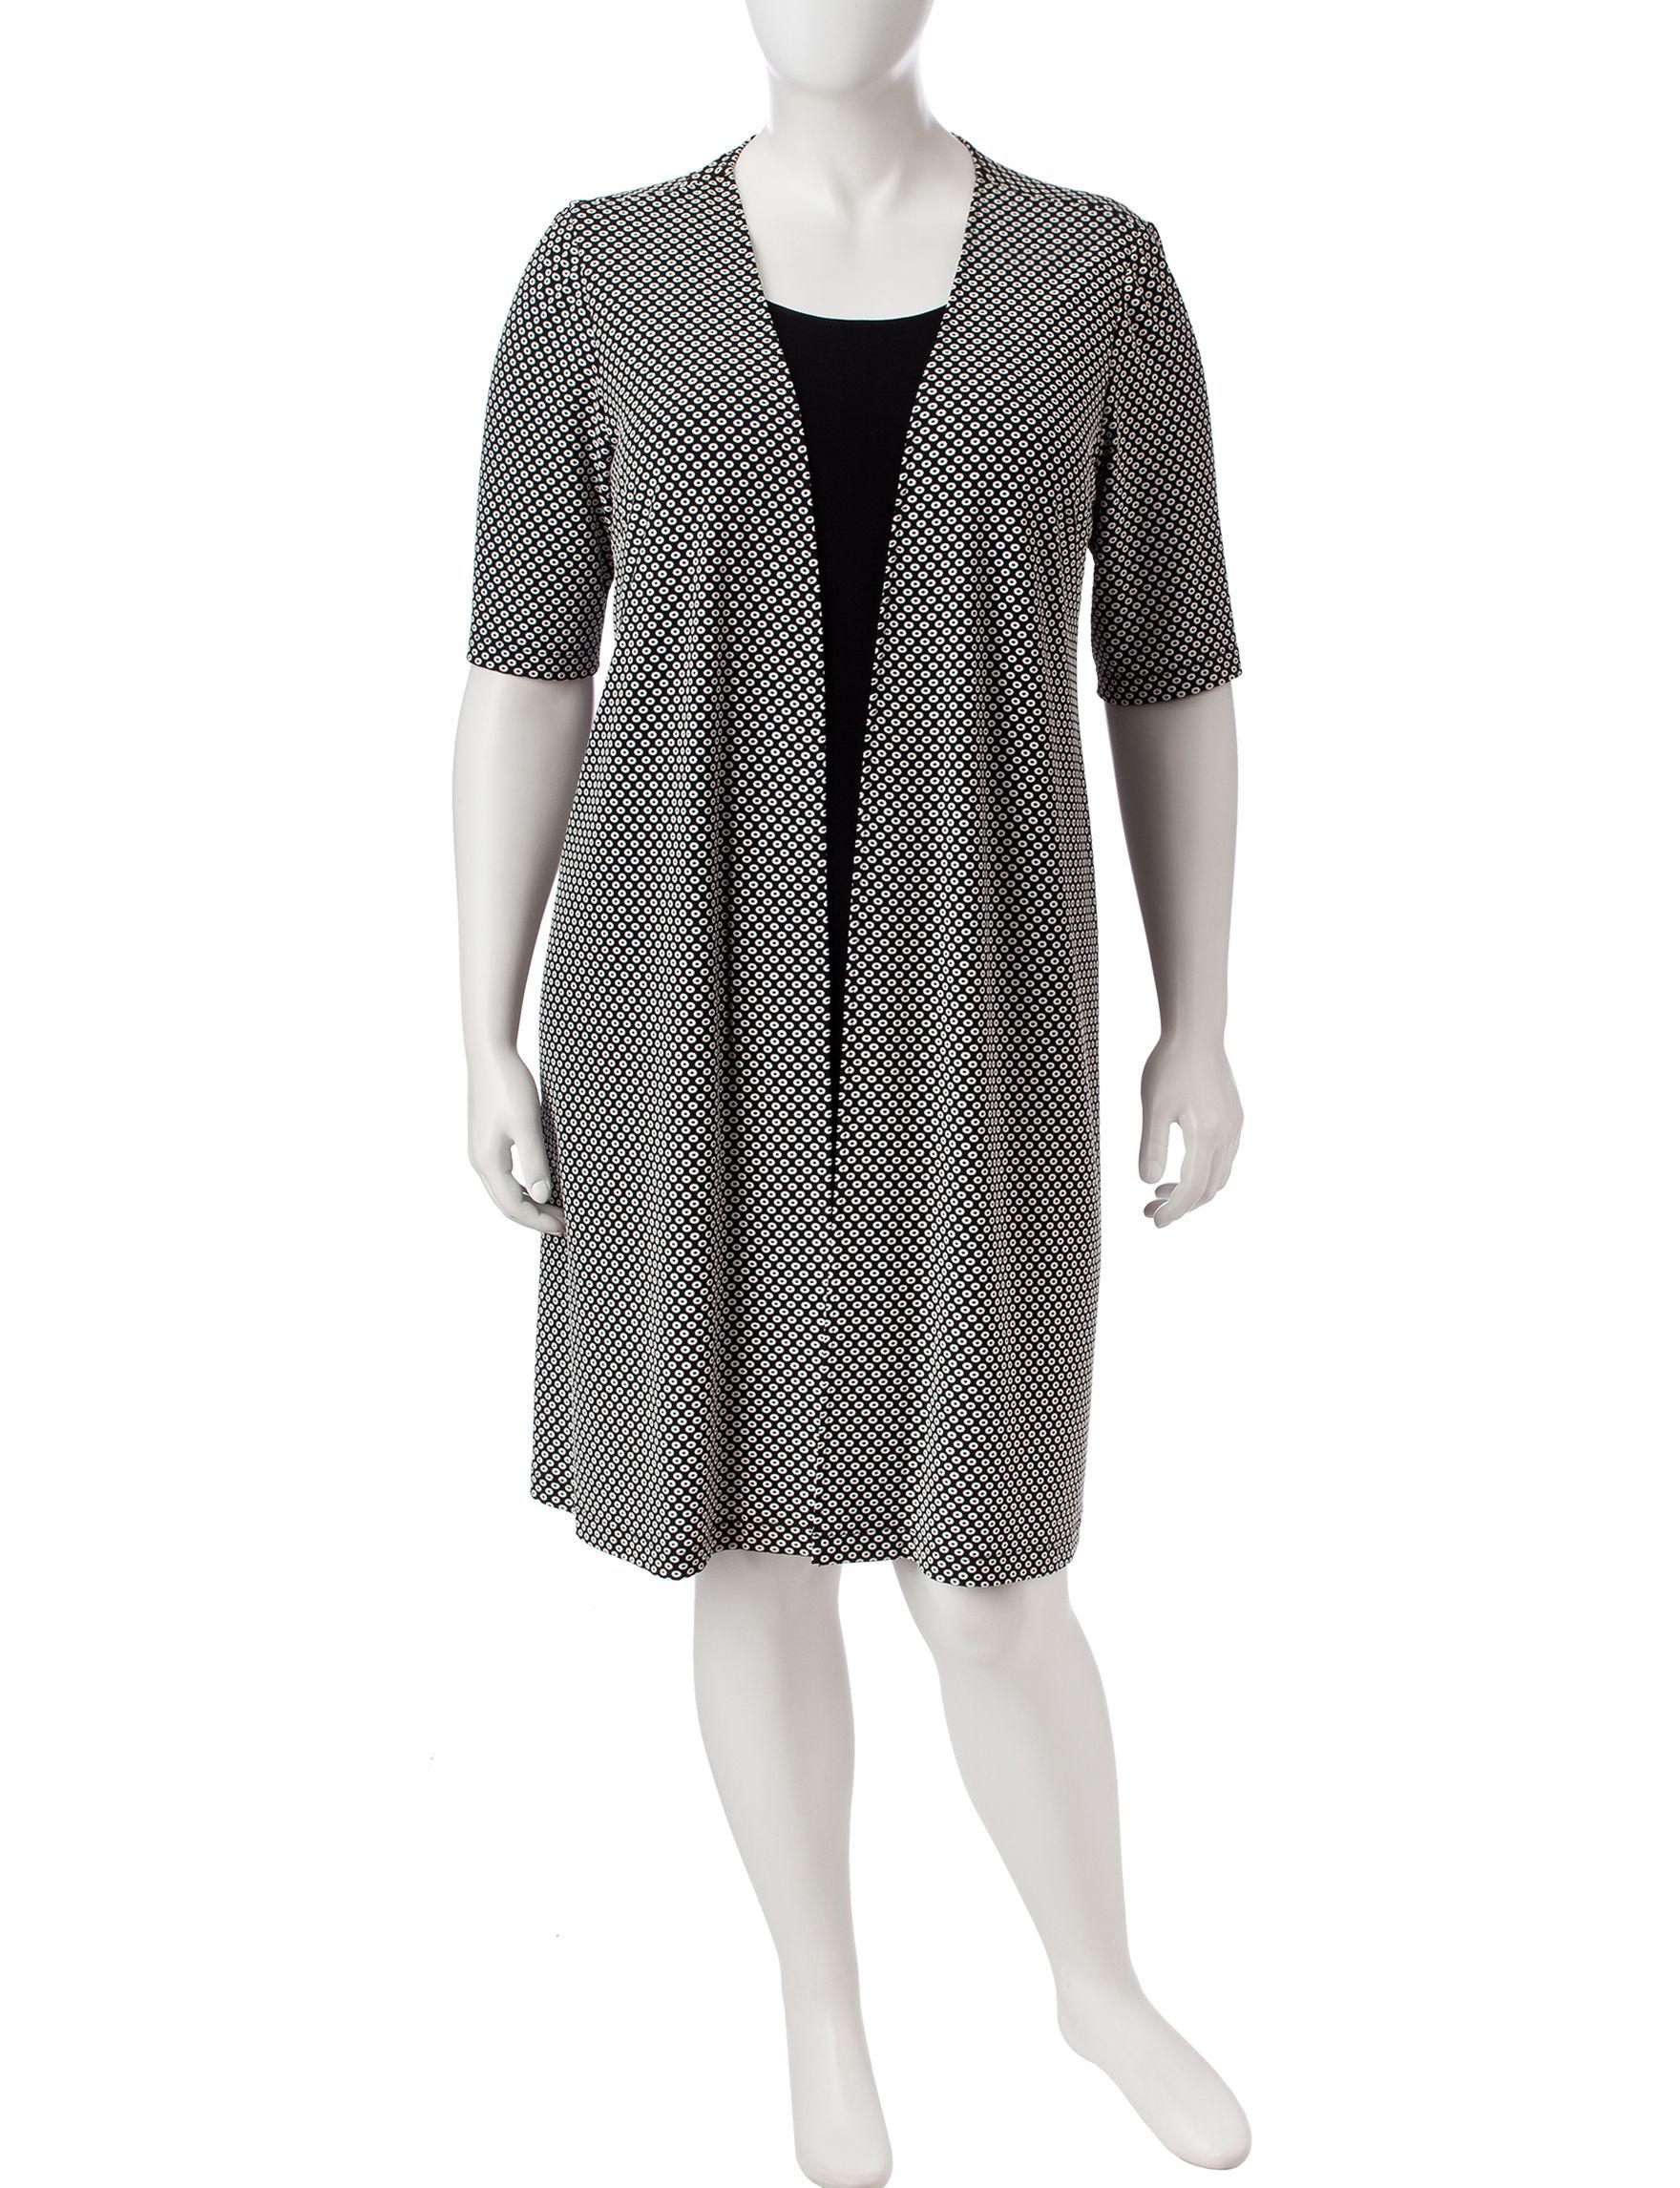 Perceptions Black /  White Everyday & Casual Jacket Dresses